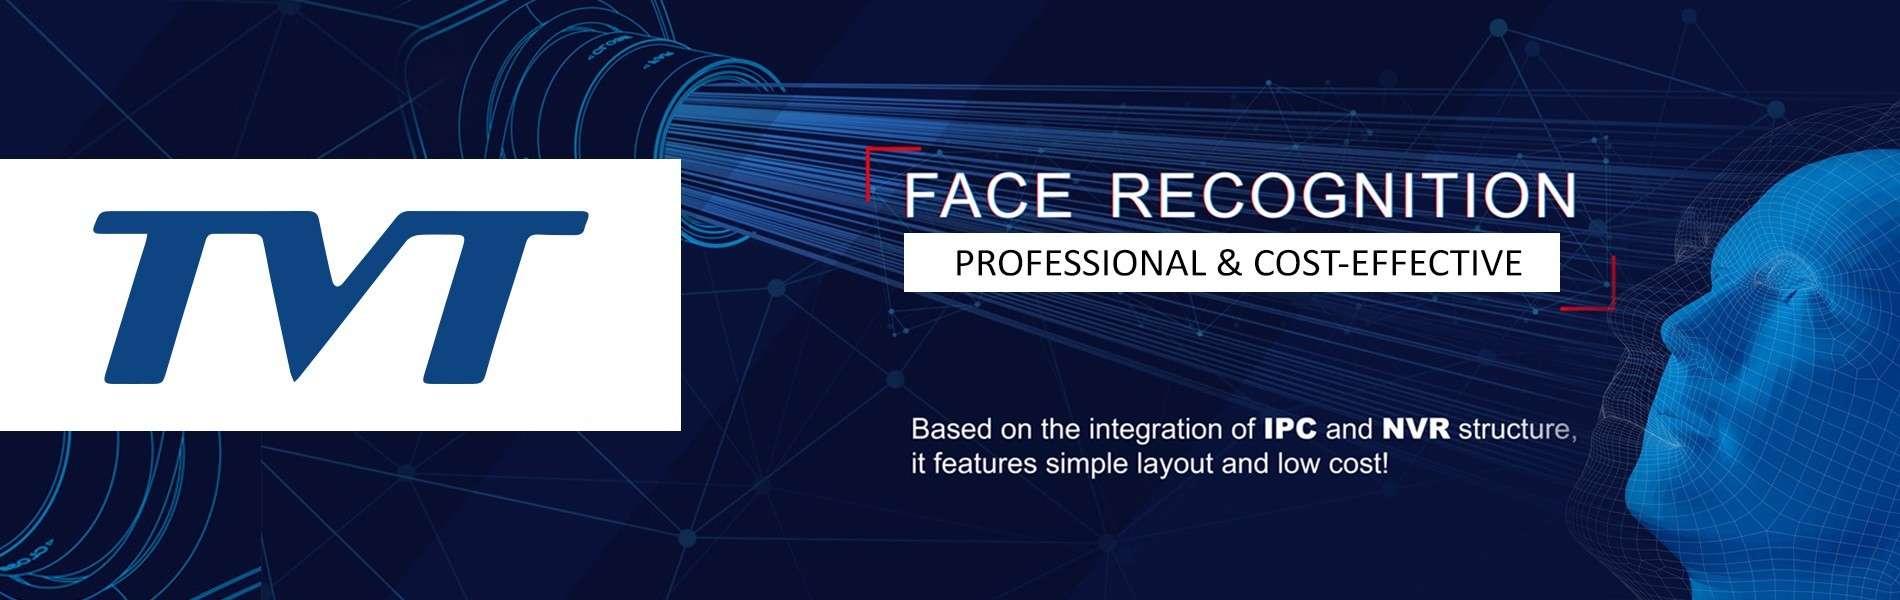 TVT FACE RECOGNITION SYSTEM